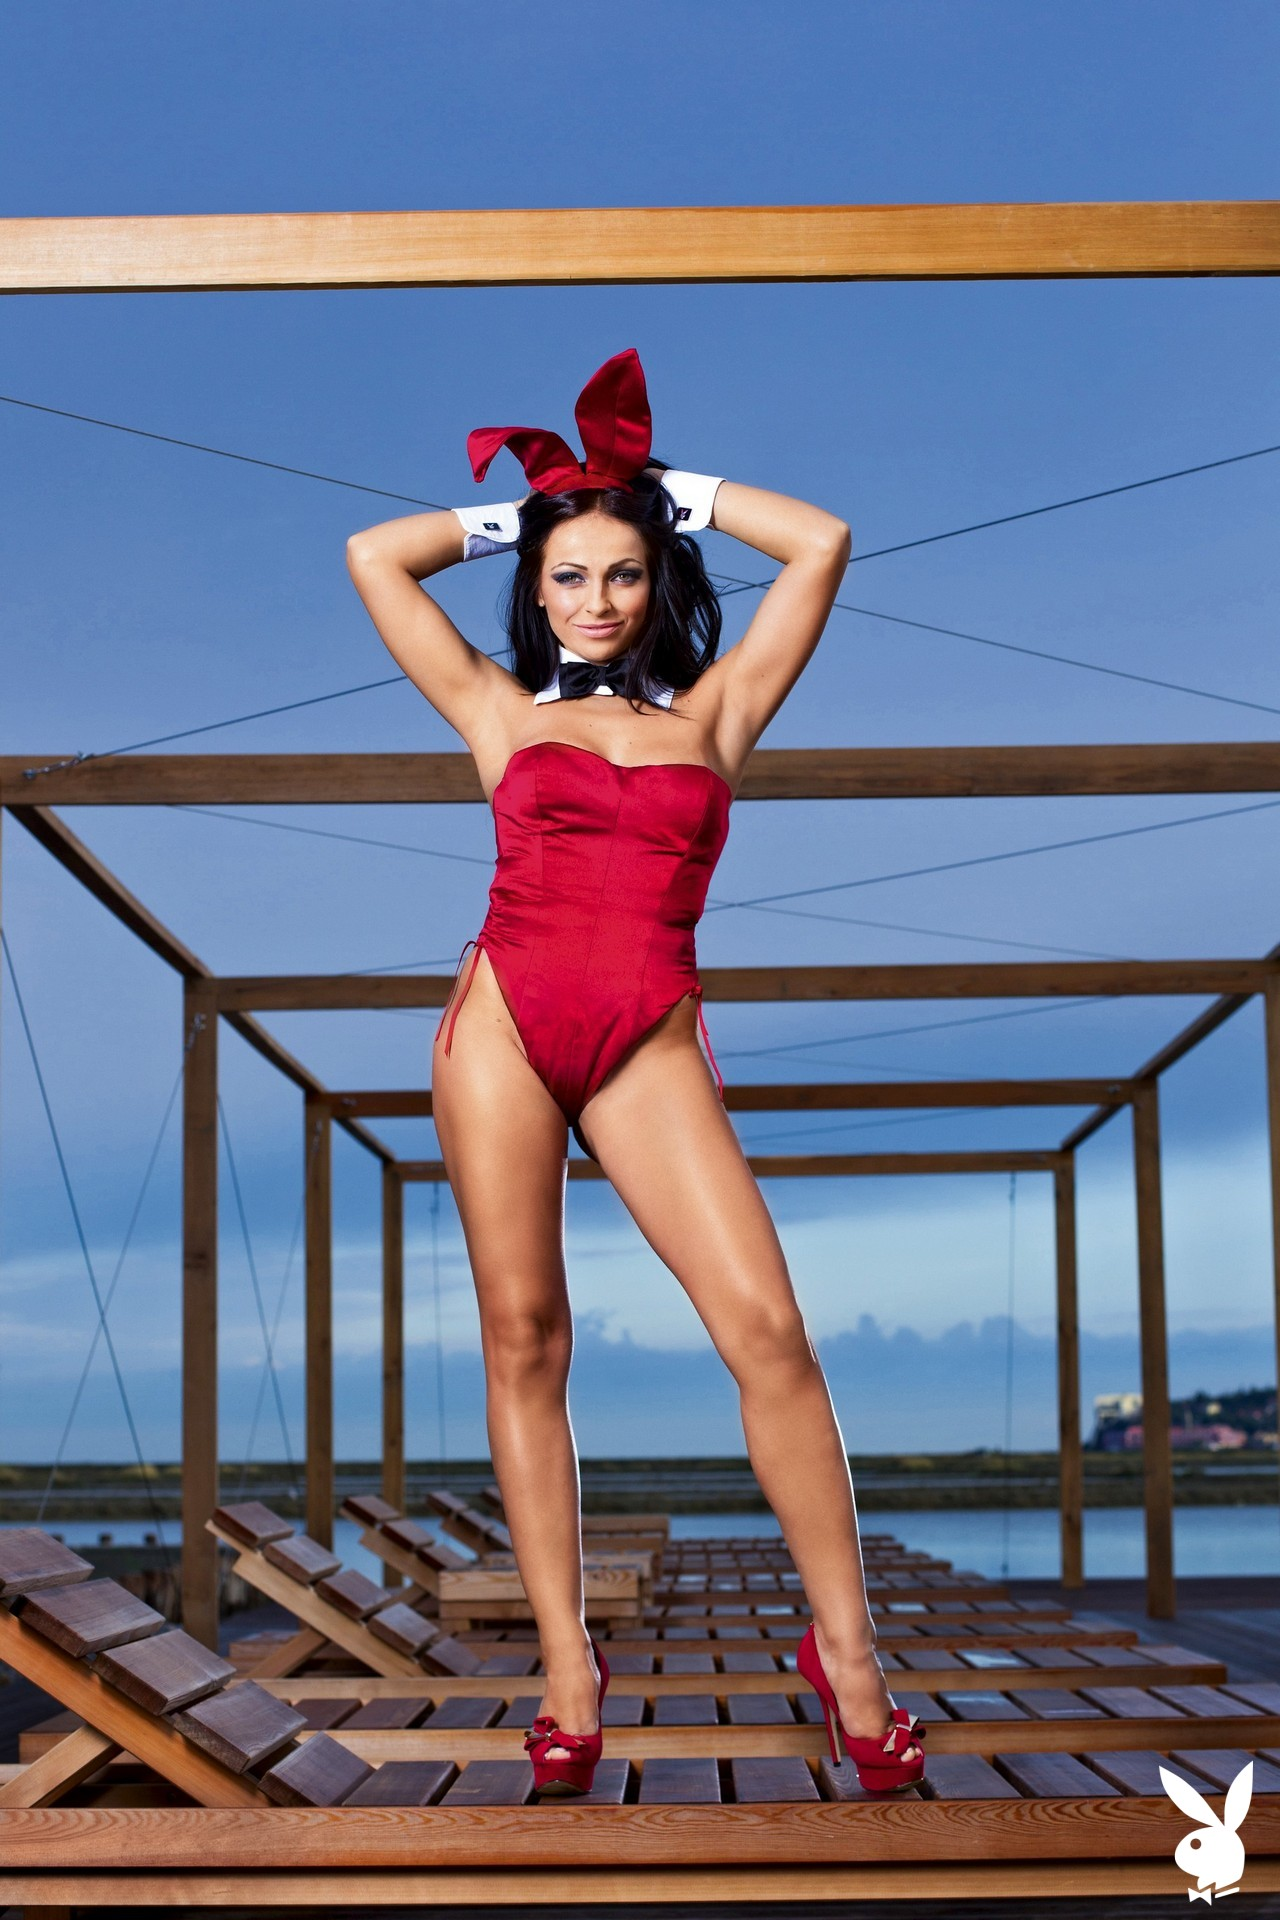 Bunny Costume, Spa, Resort, Sea Side, Deck Chair, Lounge Chair, Stiletto Heels